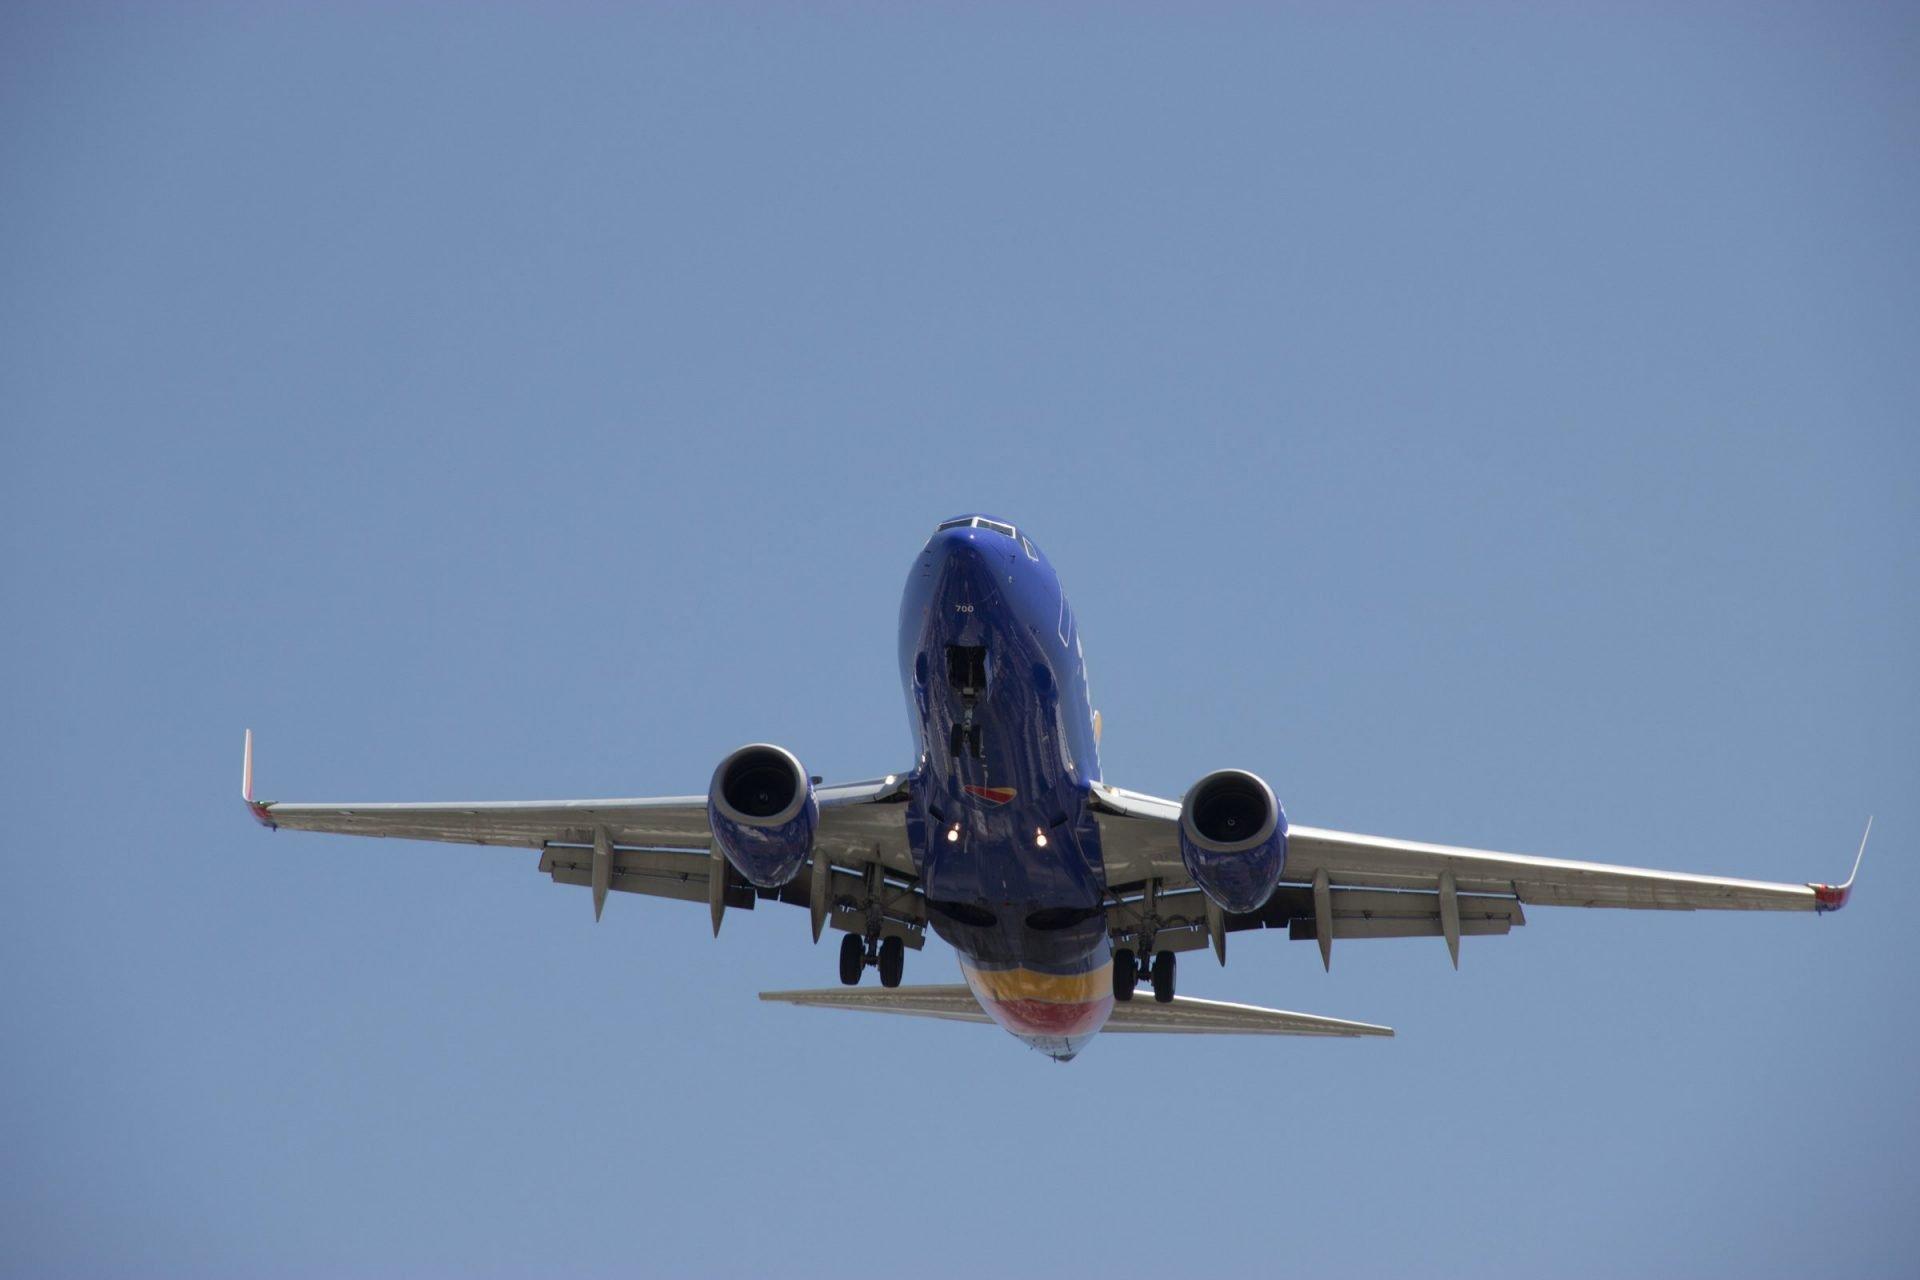 Bottom Of Plane In Sky